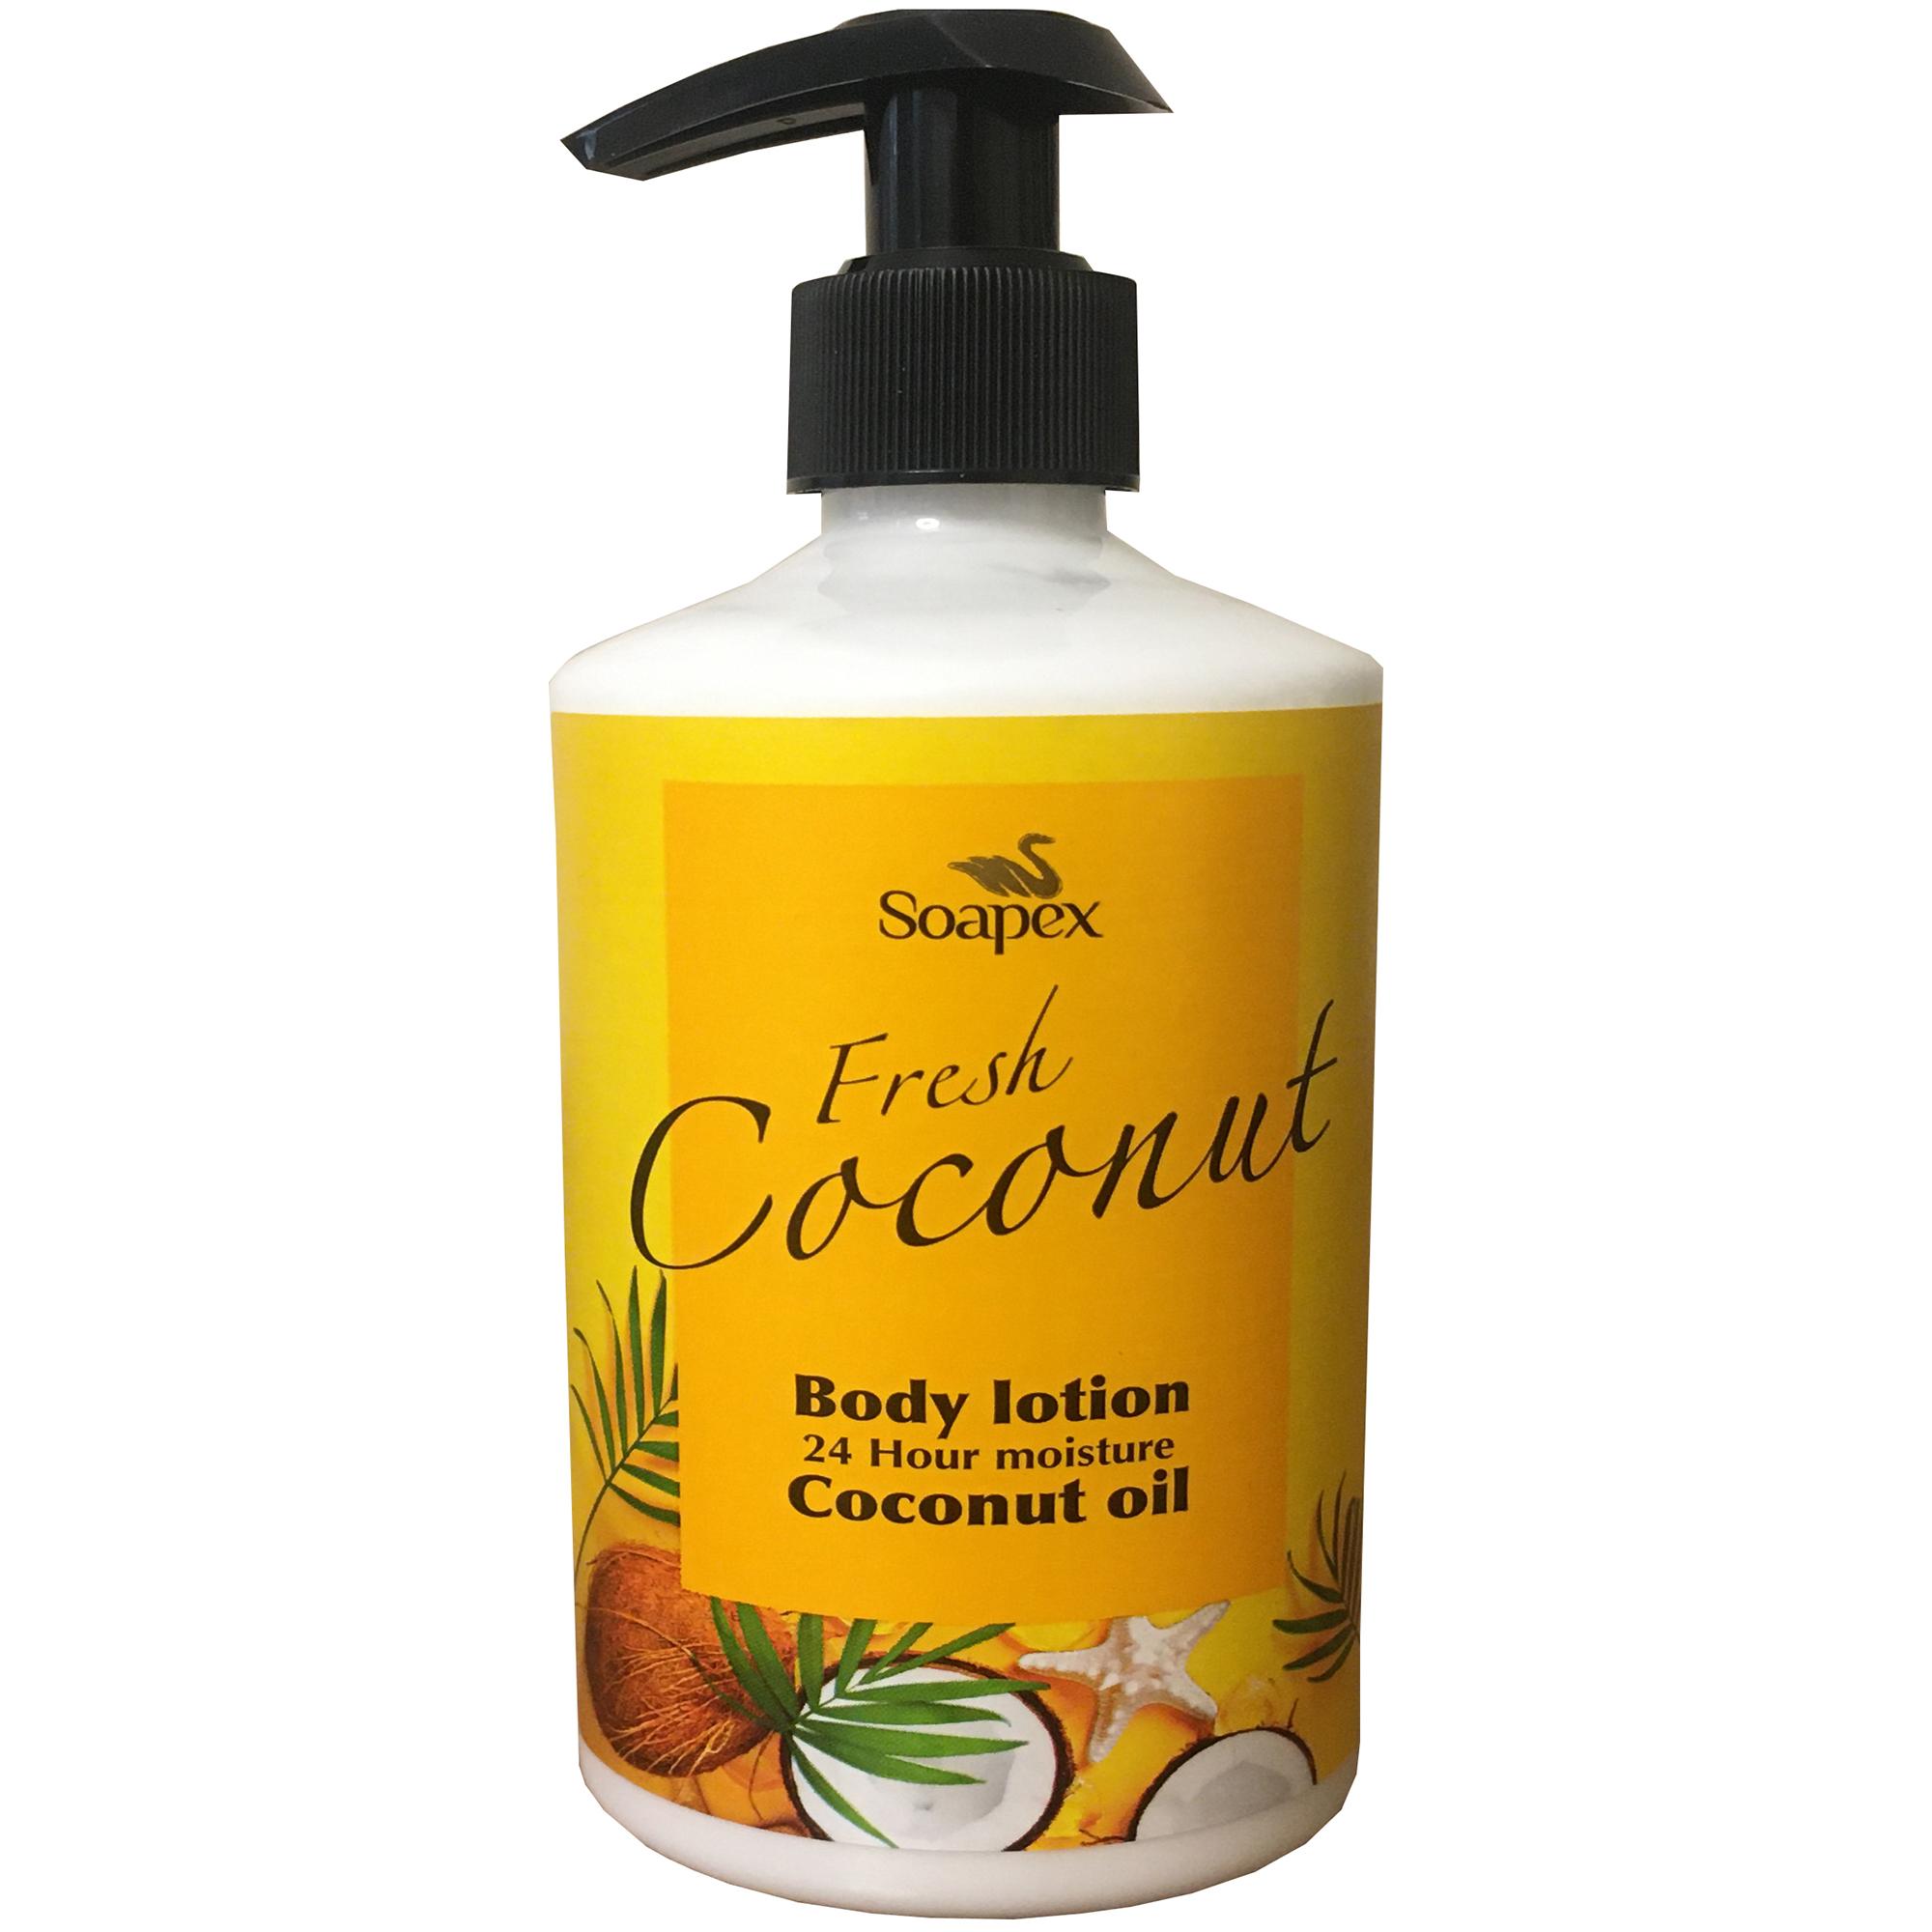 لوسیون بدن سوپکس مدل Coconut oil حجم 350 میلی لیتر